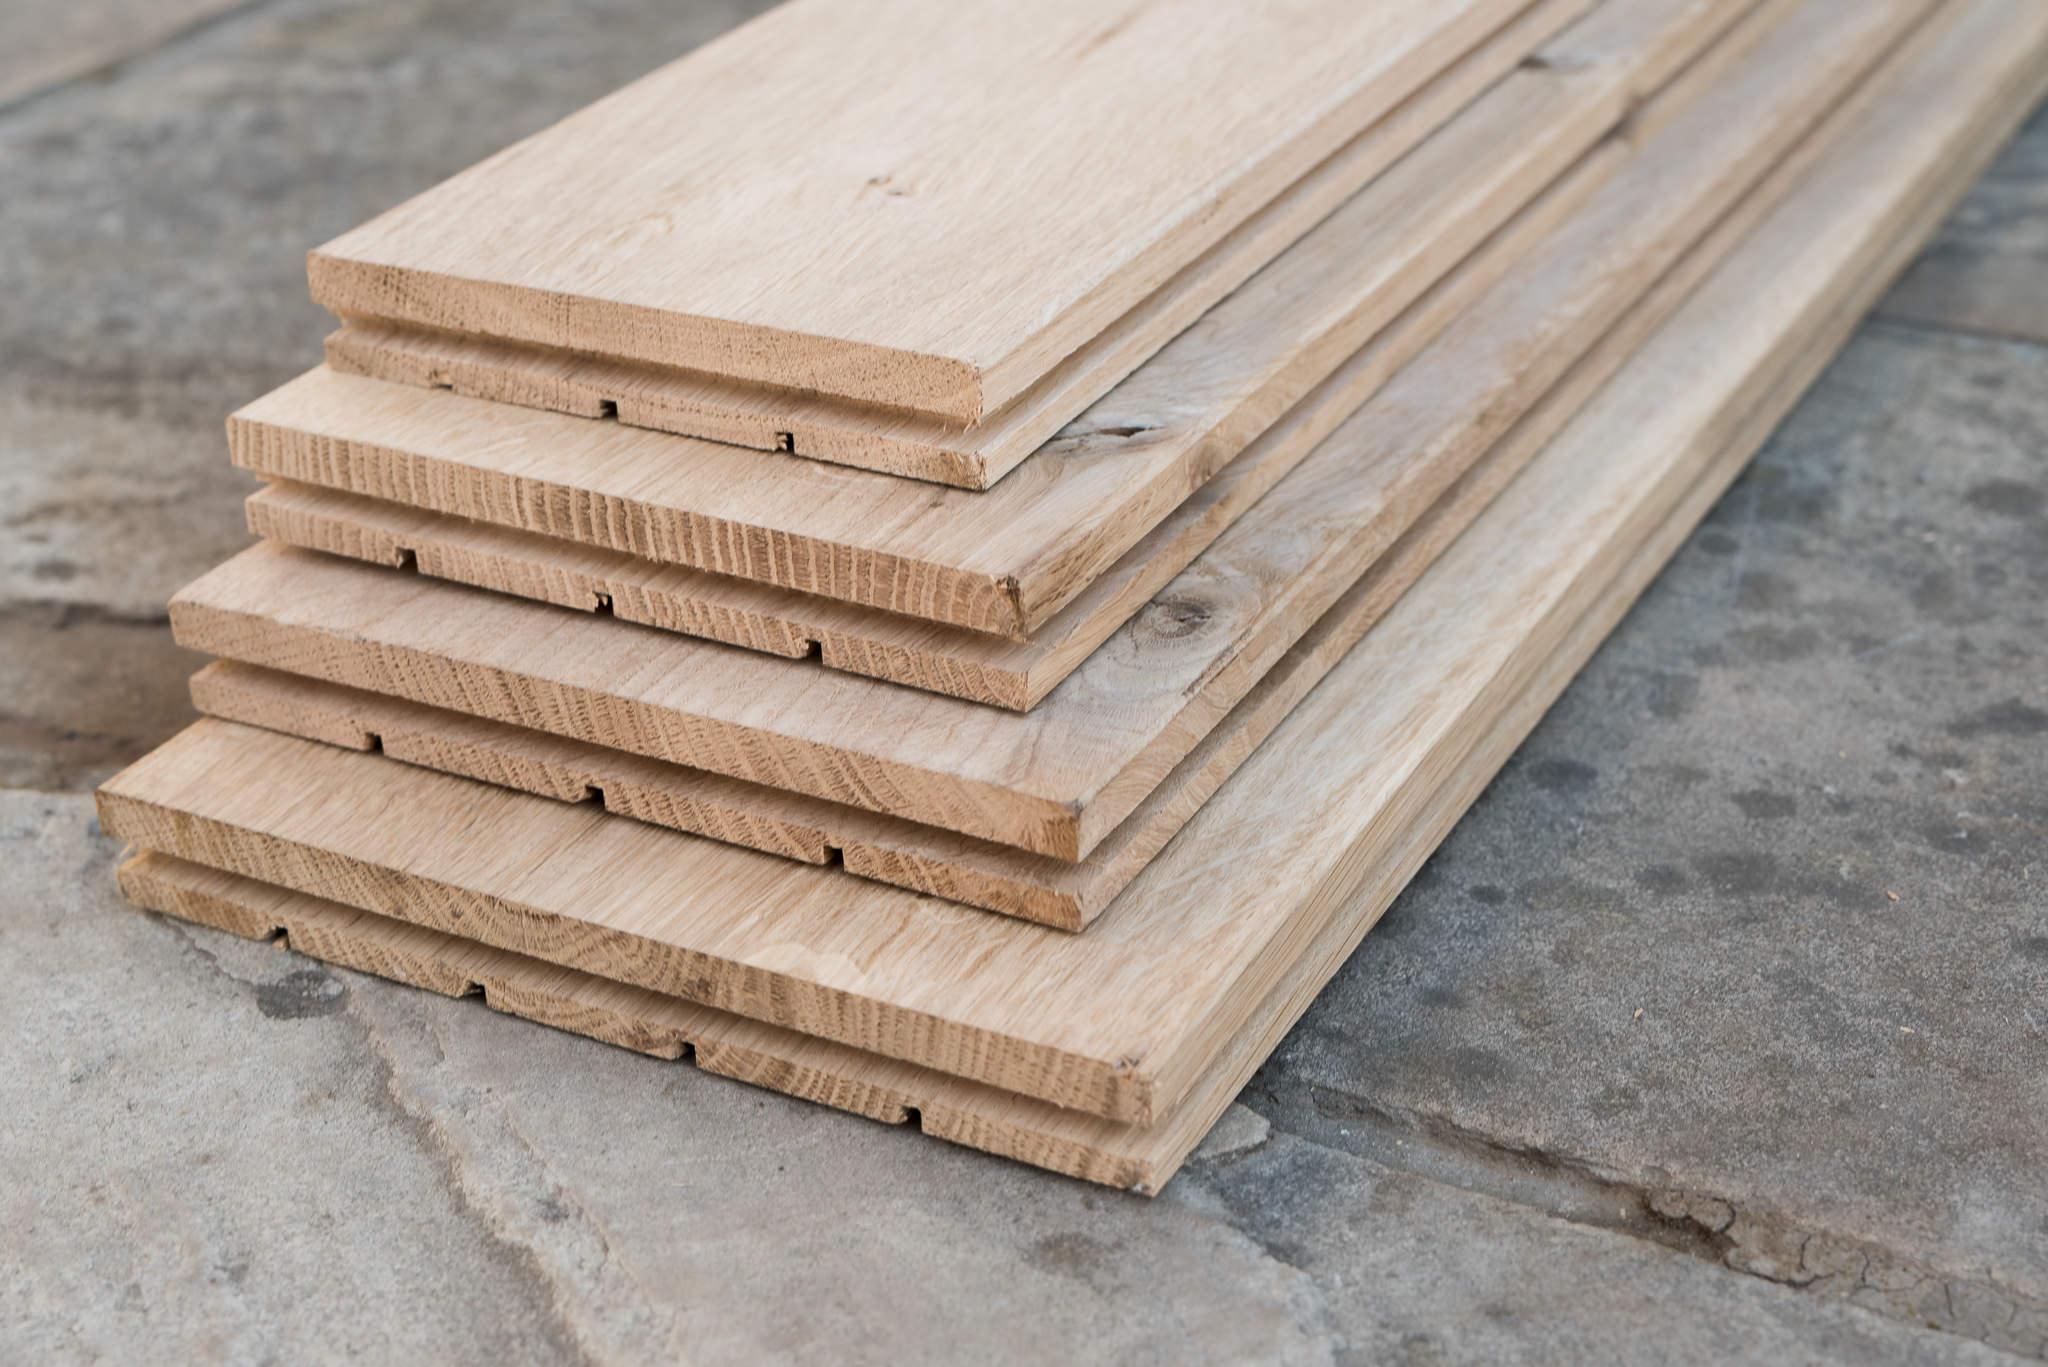 solid oak flooring solidoakflooring_5 solidoakflooring_4 solidoakflooring_2 img_5436  solid_oak_flooring_character_1 JBRTCQD